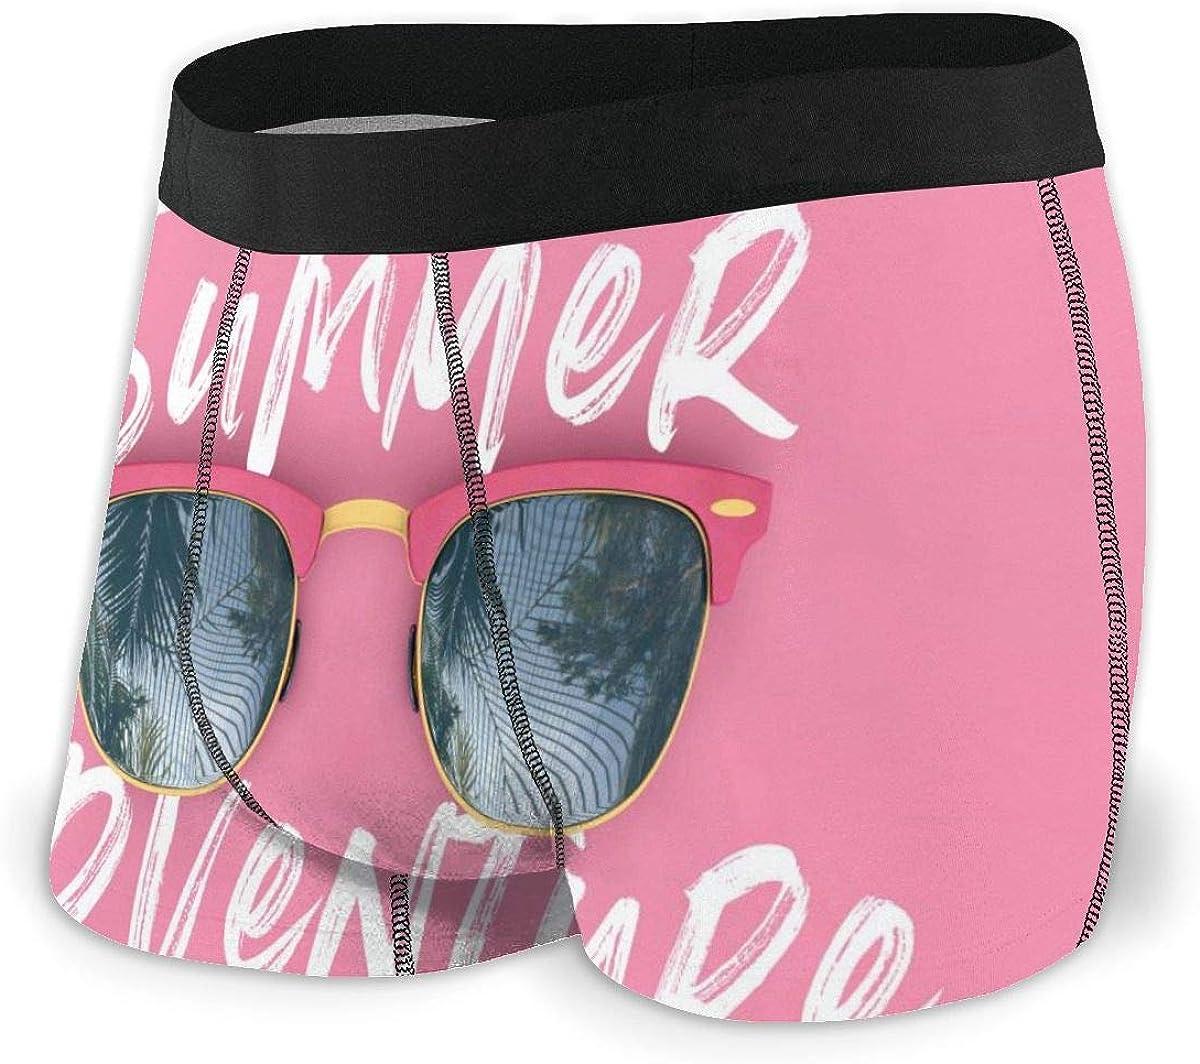 Randolph Wordsworth Mens Boxer Briefs Summer Adventure Sunglasses Pink Breathable Underwear